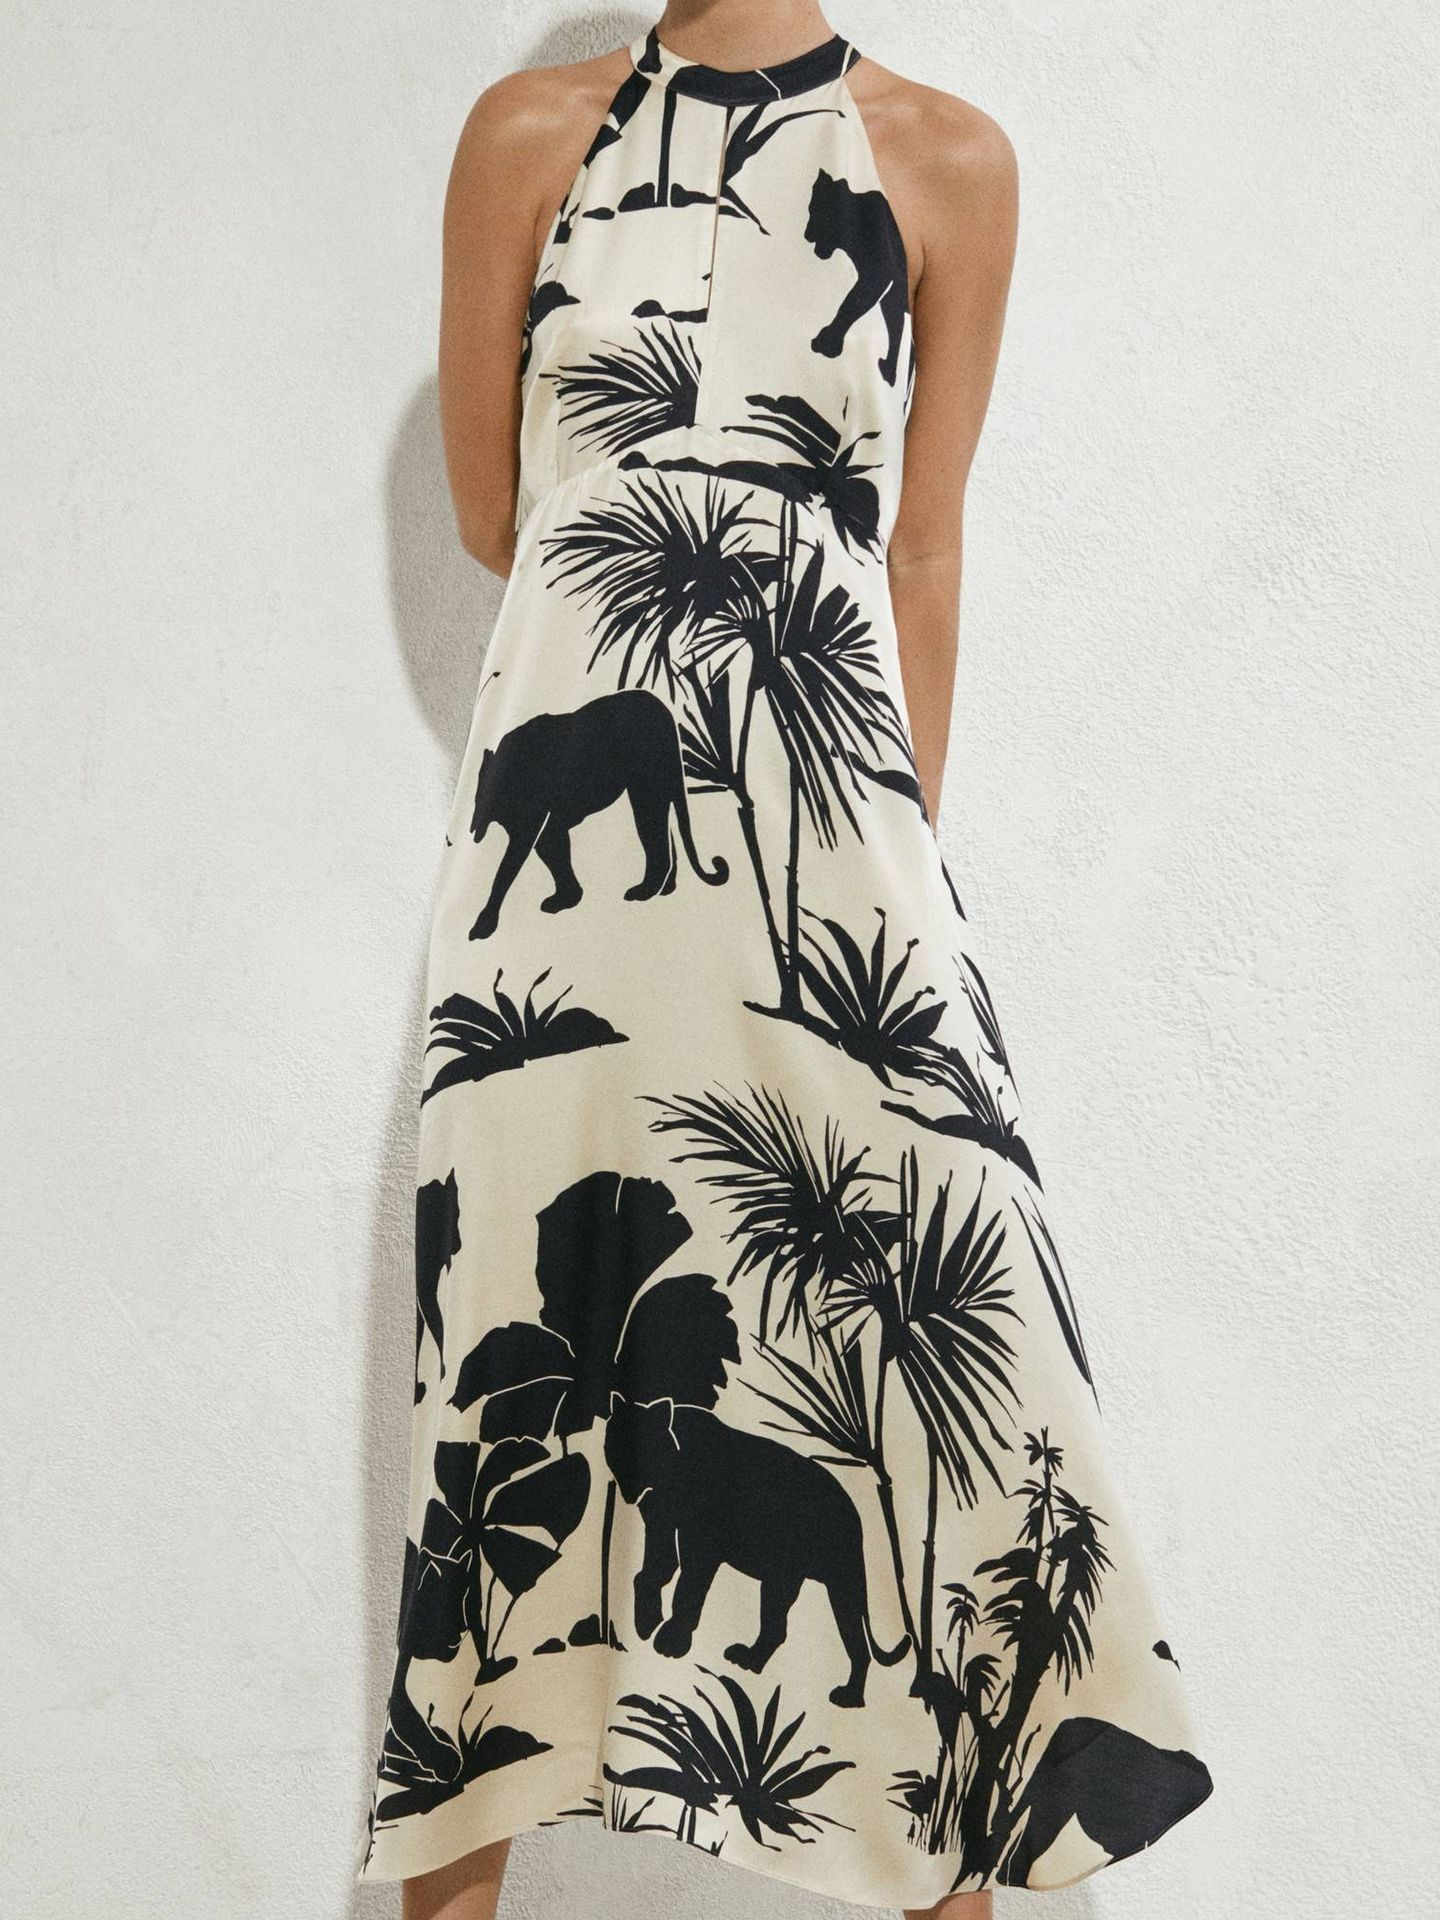 Vestido safari de Massimo Dutti. (Cortesía)